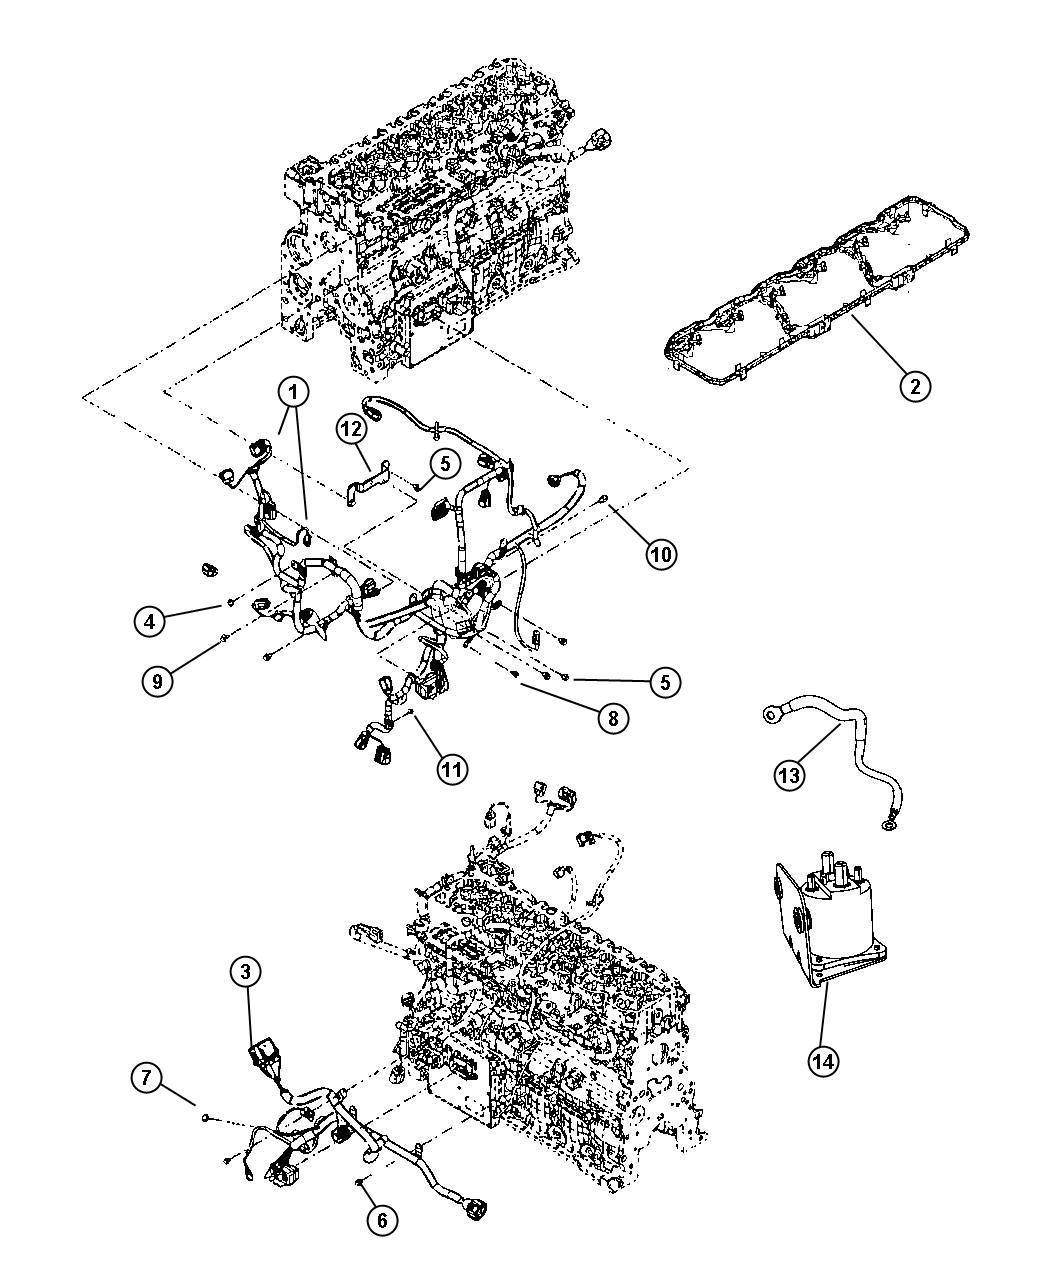 Dodge Ram 2500 Relay. G8v-rh-1a7t-r-dcx12, intake heater